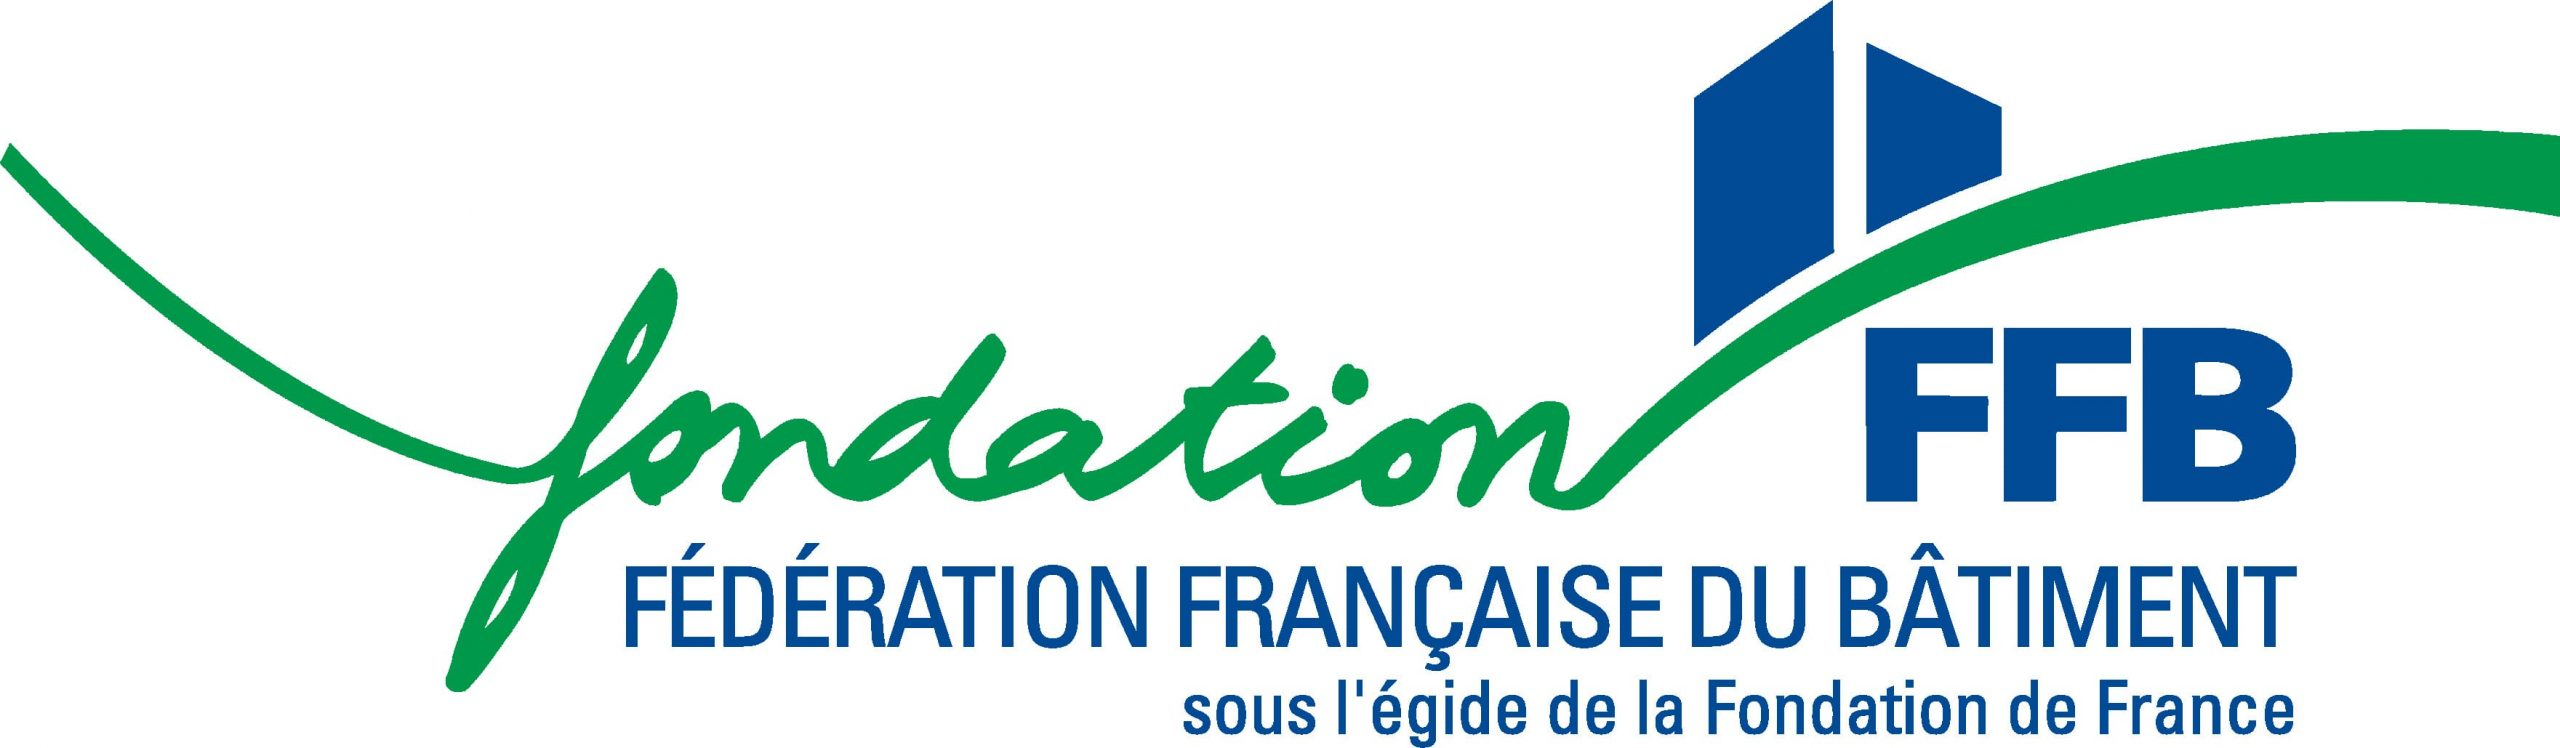 LogoFondation2018 avec 2 lignes-min